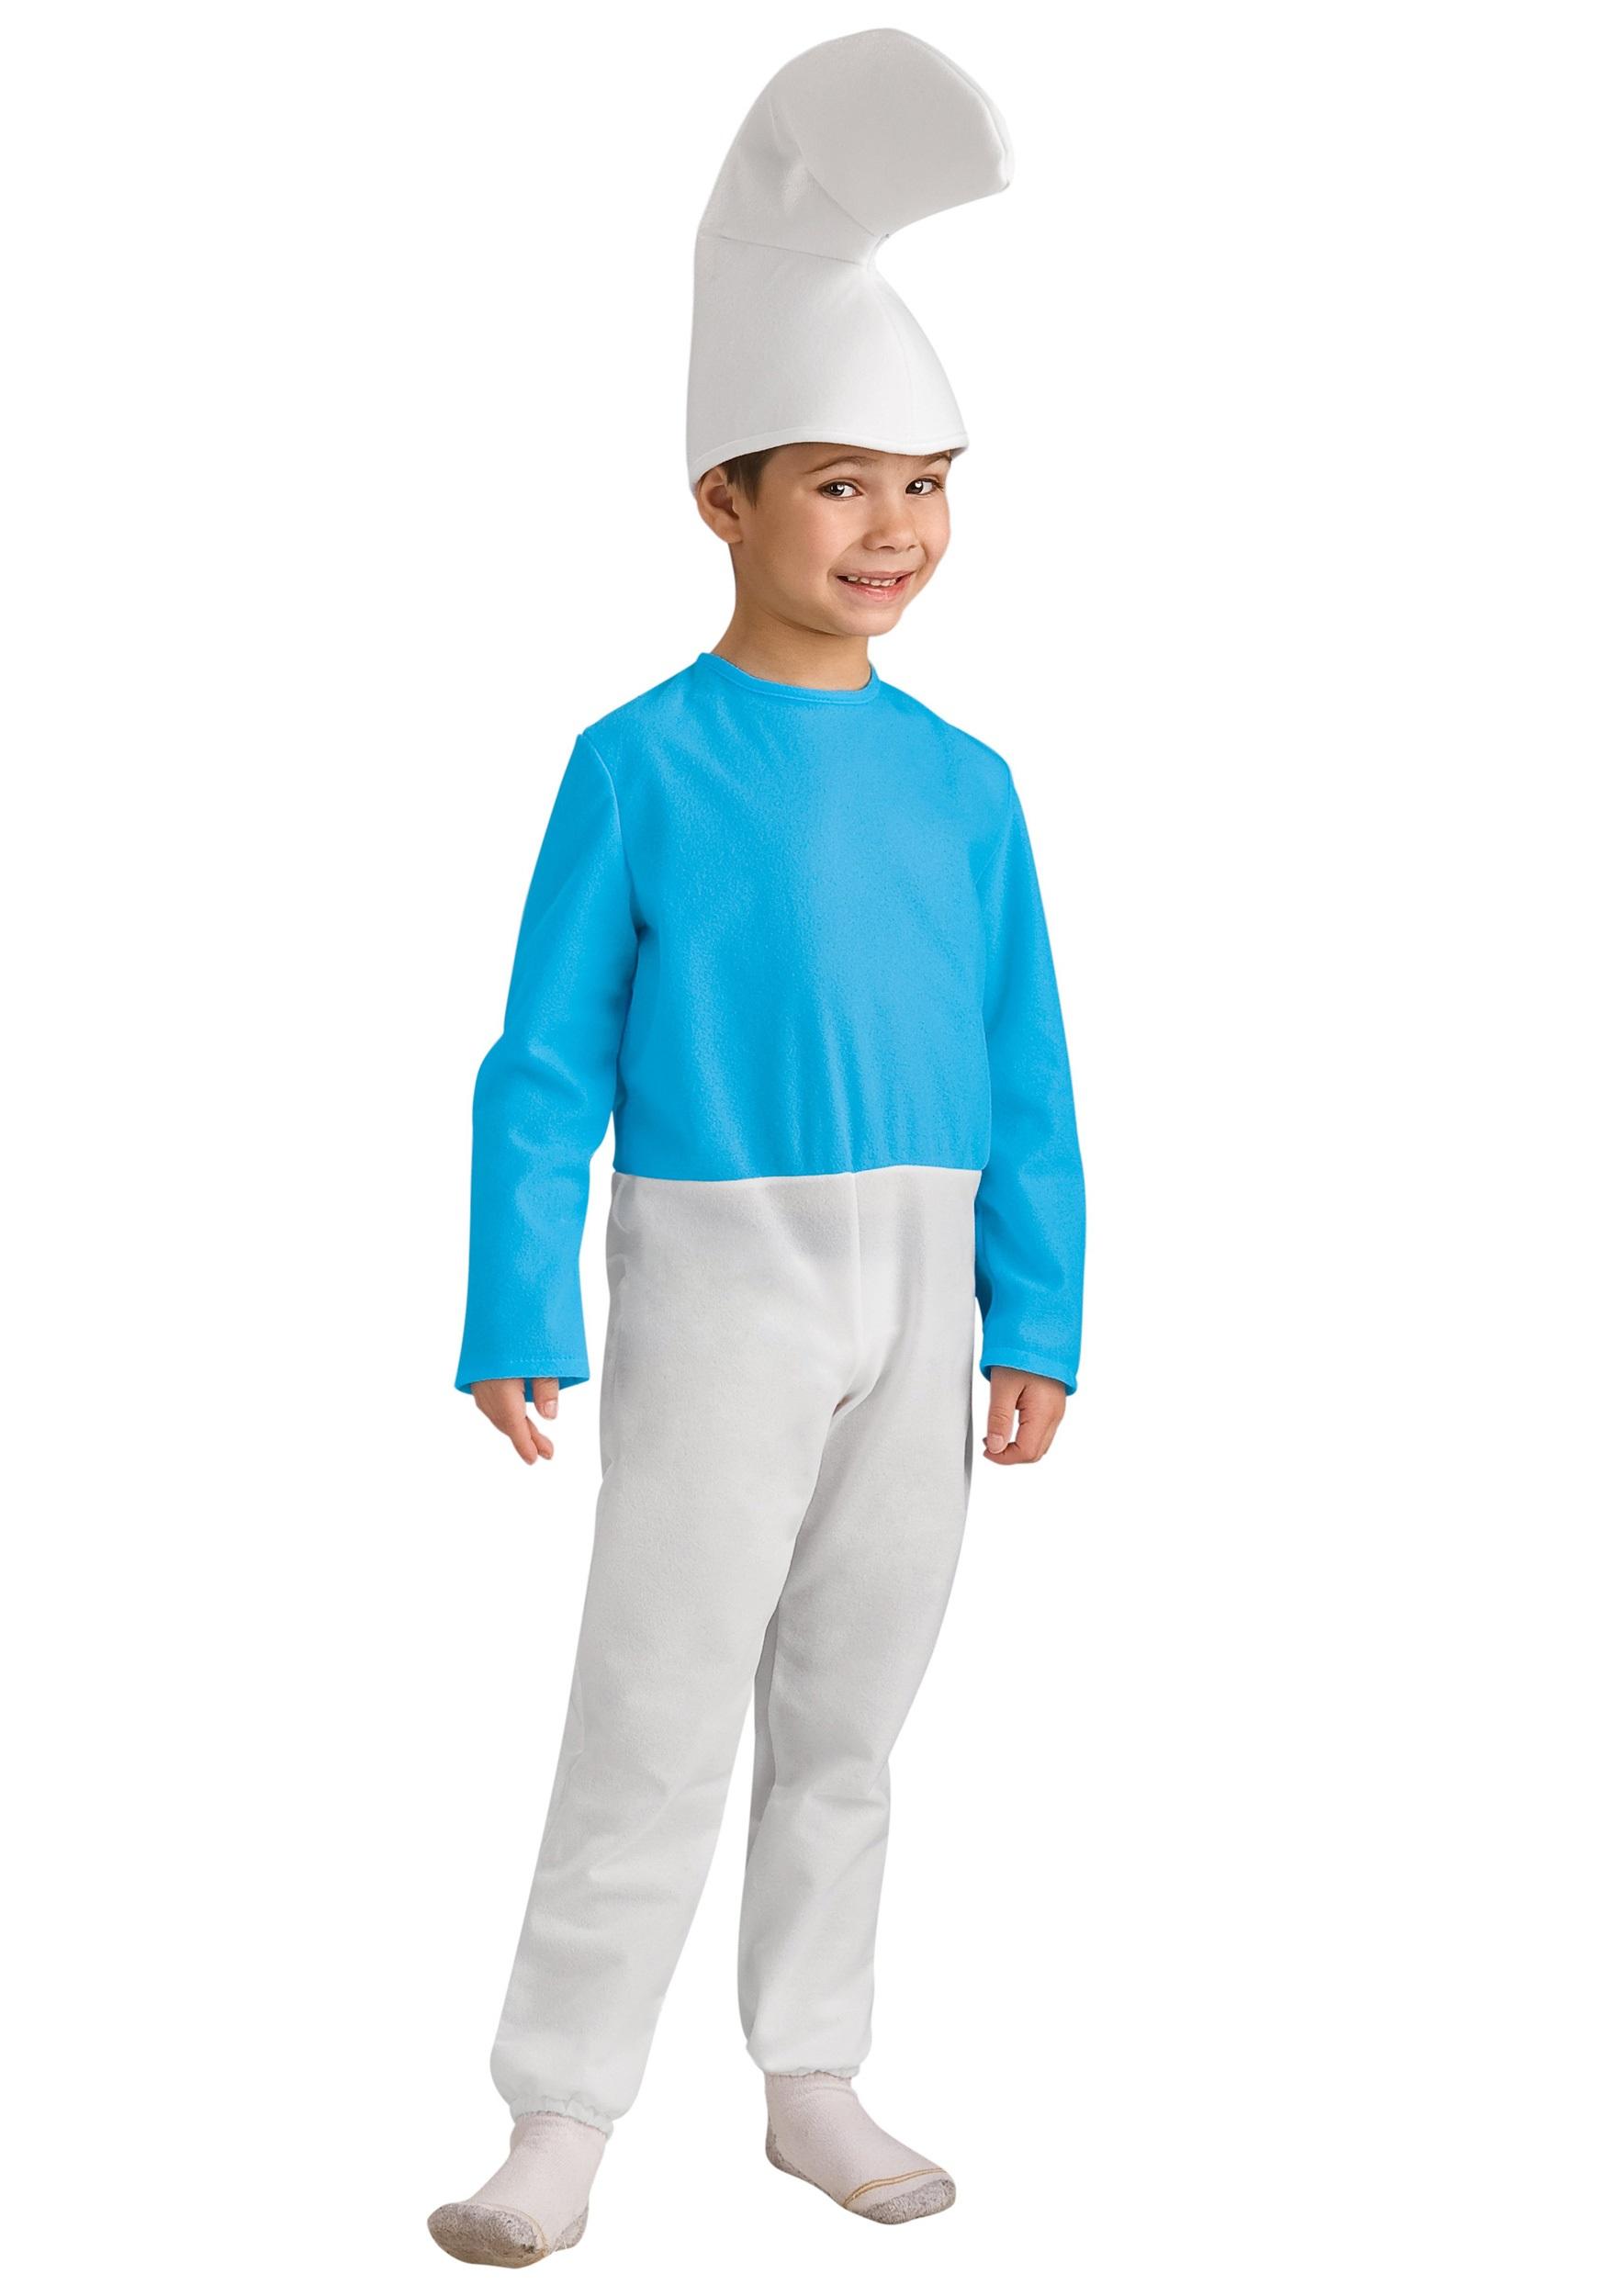 Child Smurf Costume - Halloween Costumes 3c348e72a